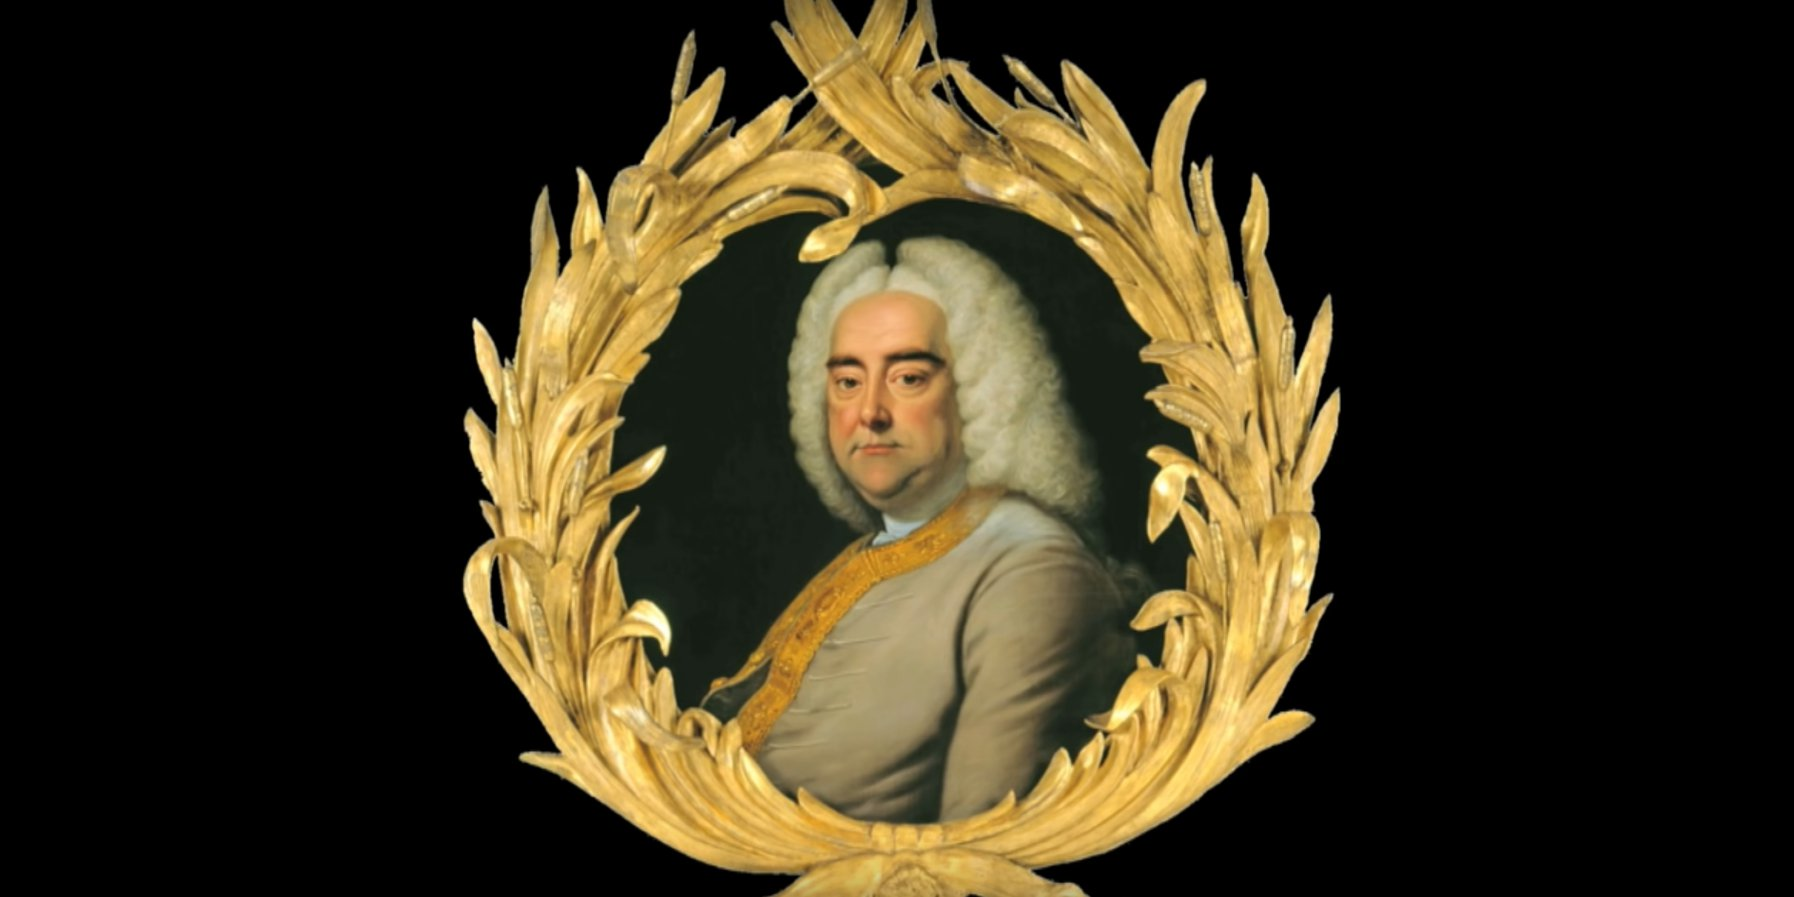 Georg Friedrich Händel: Music for the Royal Fireworks